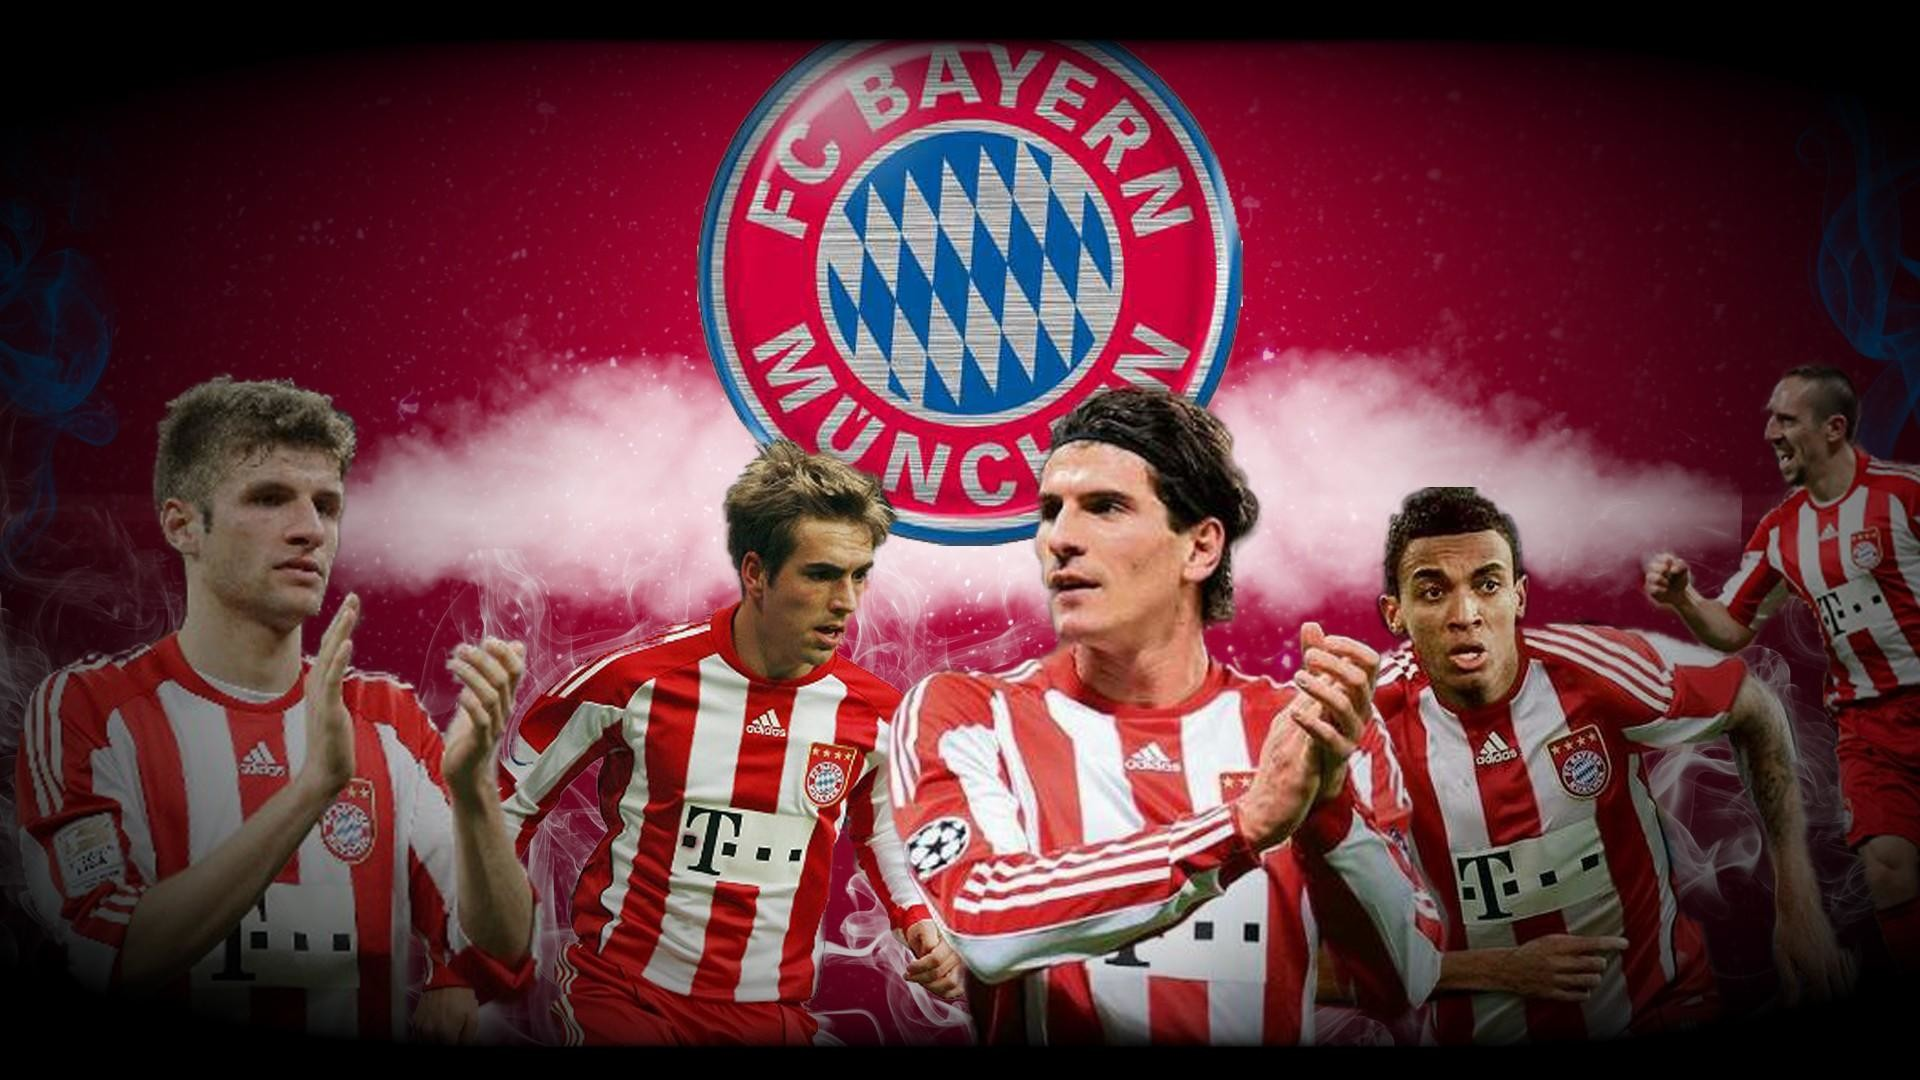 wallpaper.wiki-Free-Download-Bayern-Munich-Background-PIC-